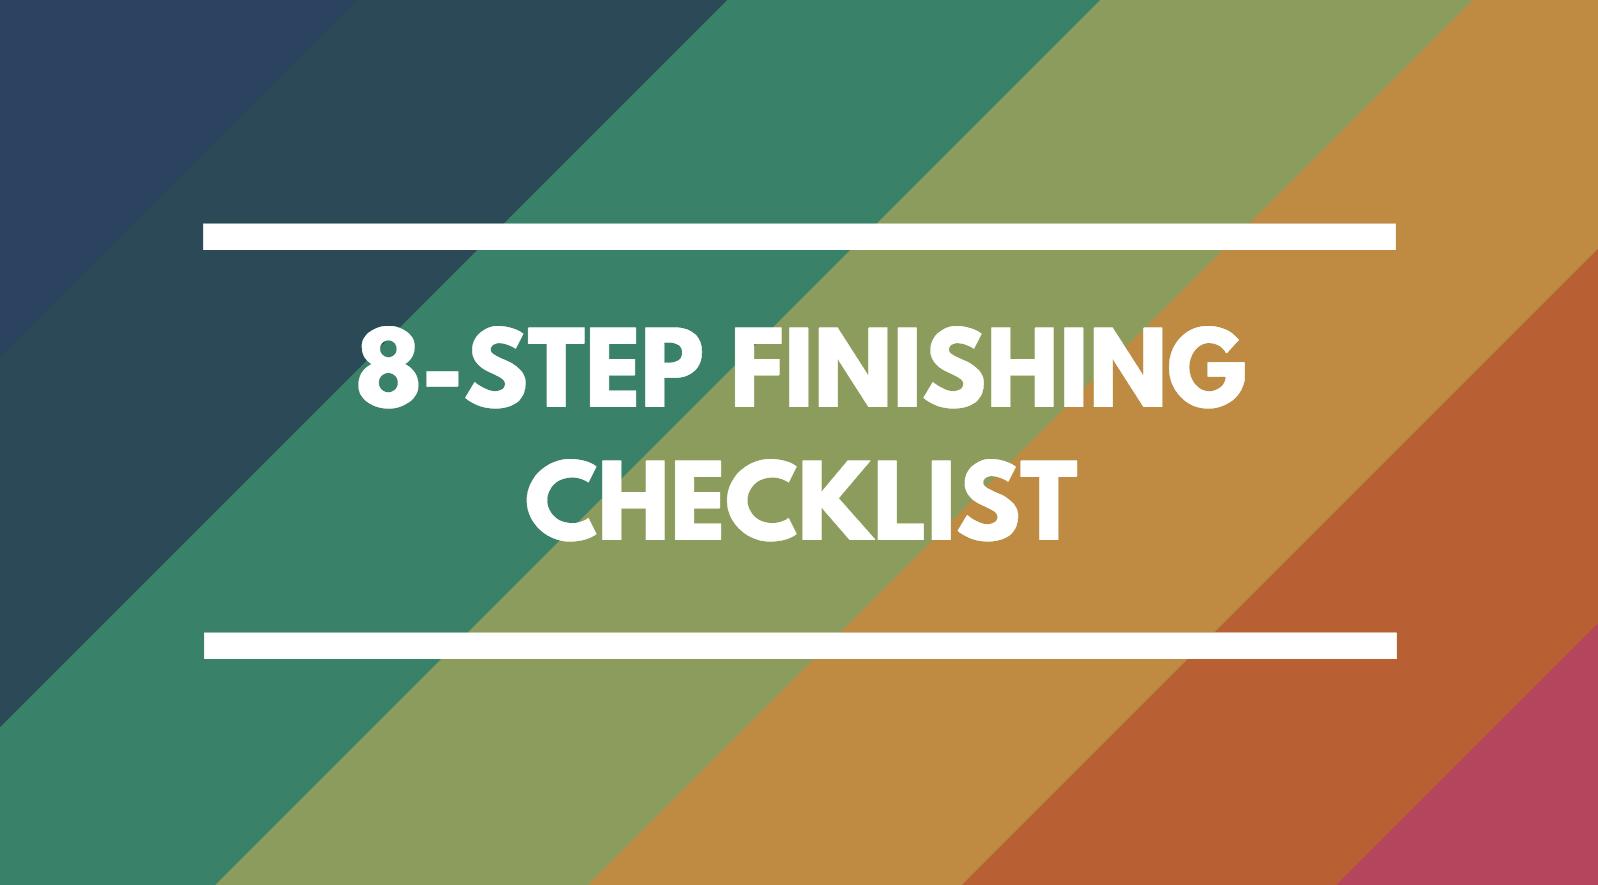 hyperbits-8-step-finishing-checklist-image